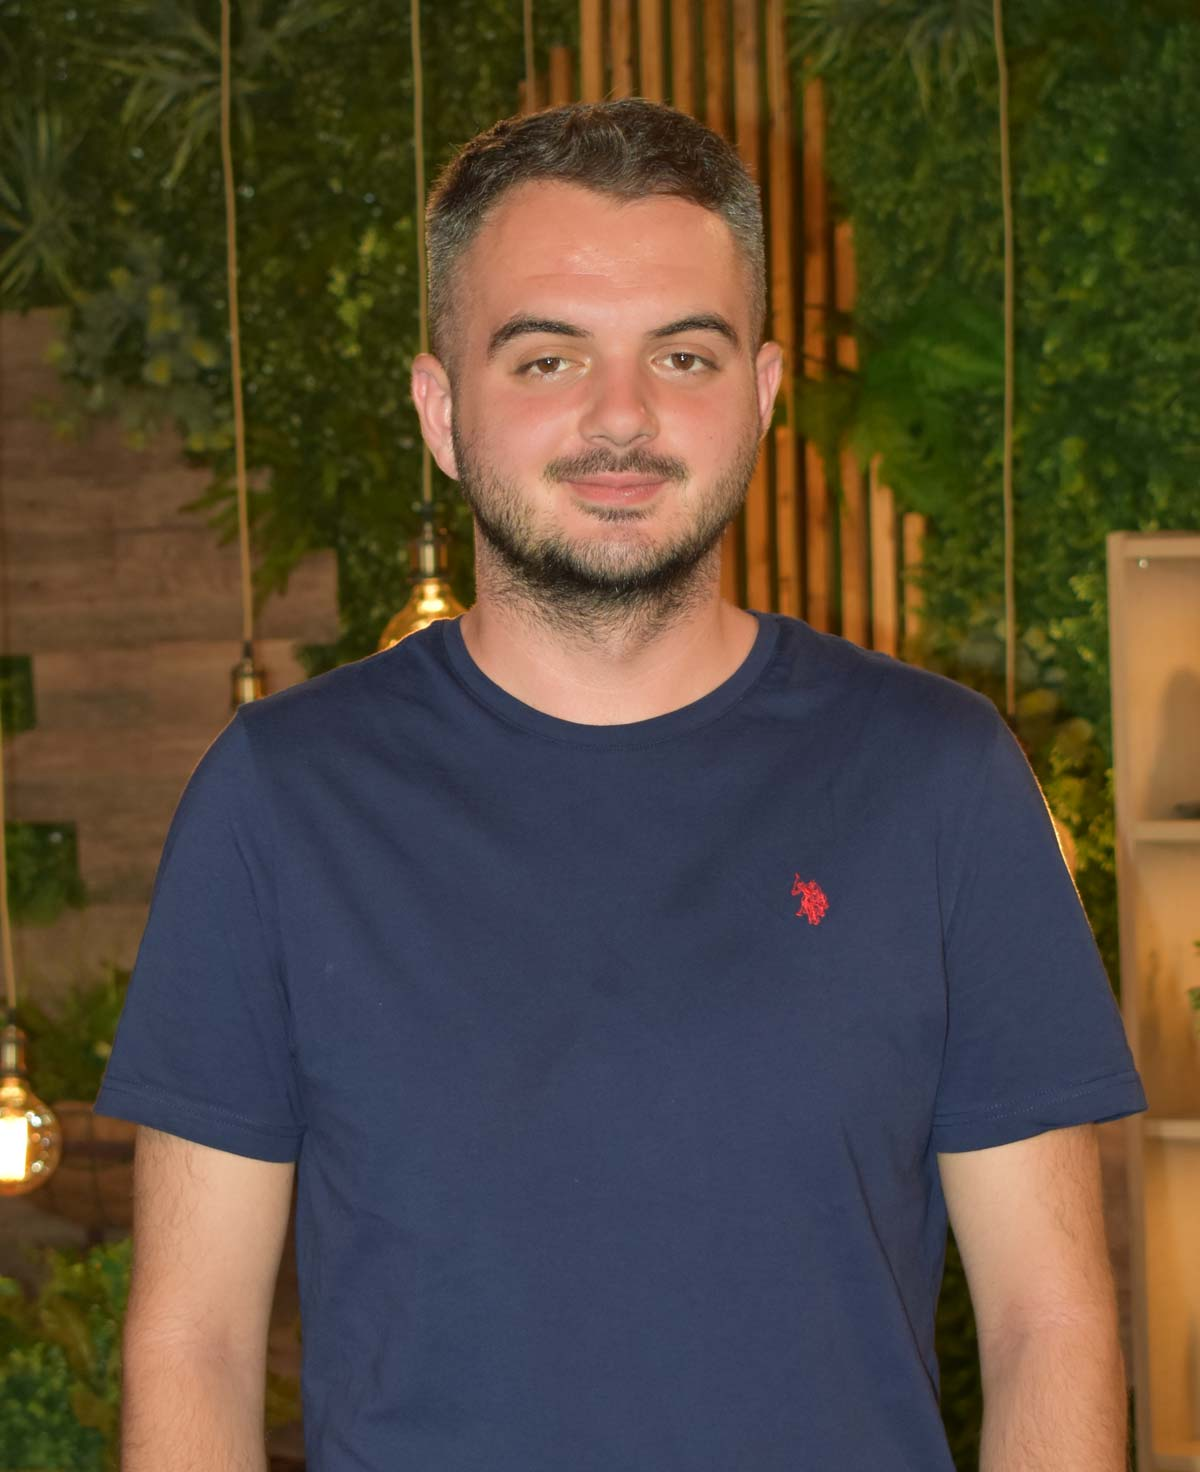 Constantin Ţapordei - EM360 Group